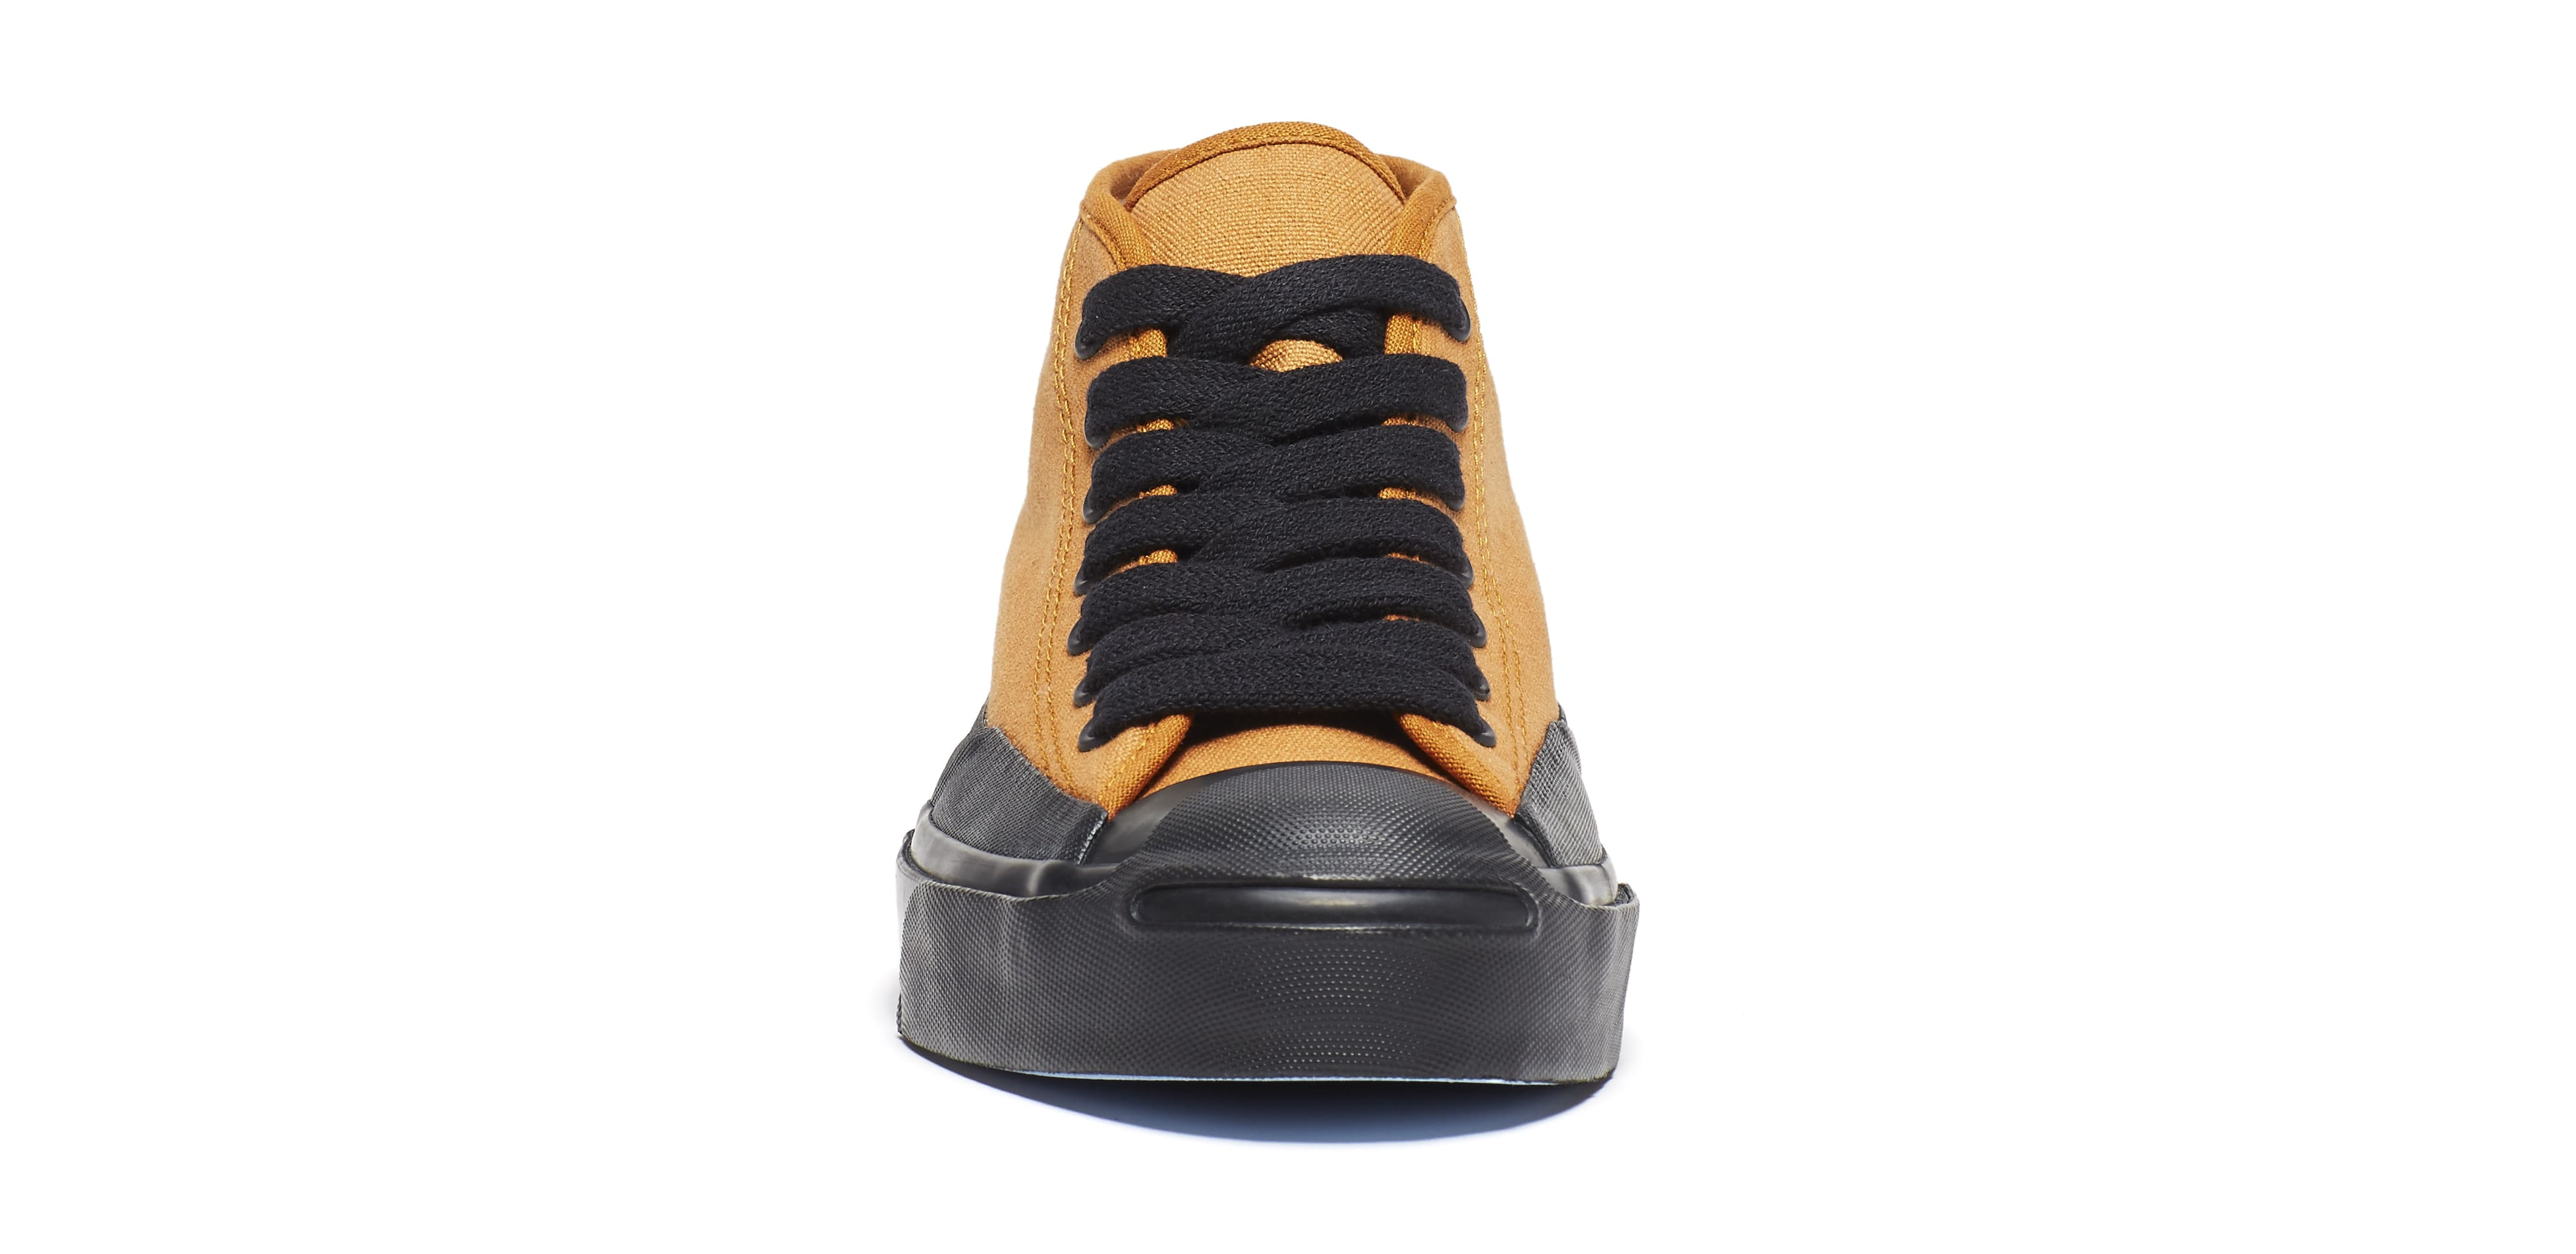 ASAP Nast x Converse Jack Purcell Chukka Mid 'Pumpkin Spice' 164664C (Toe)